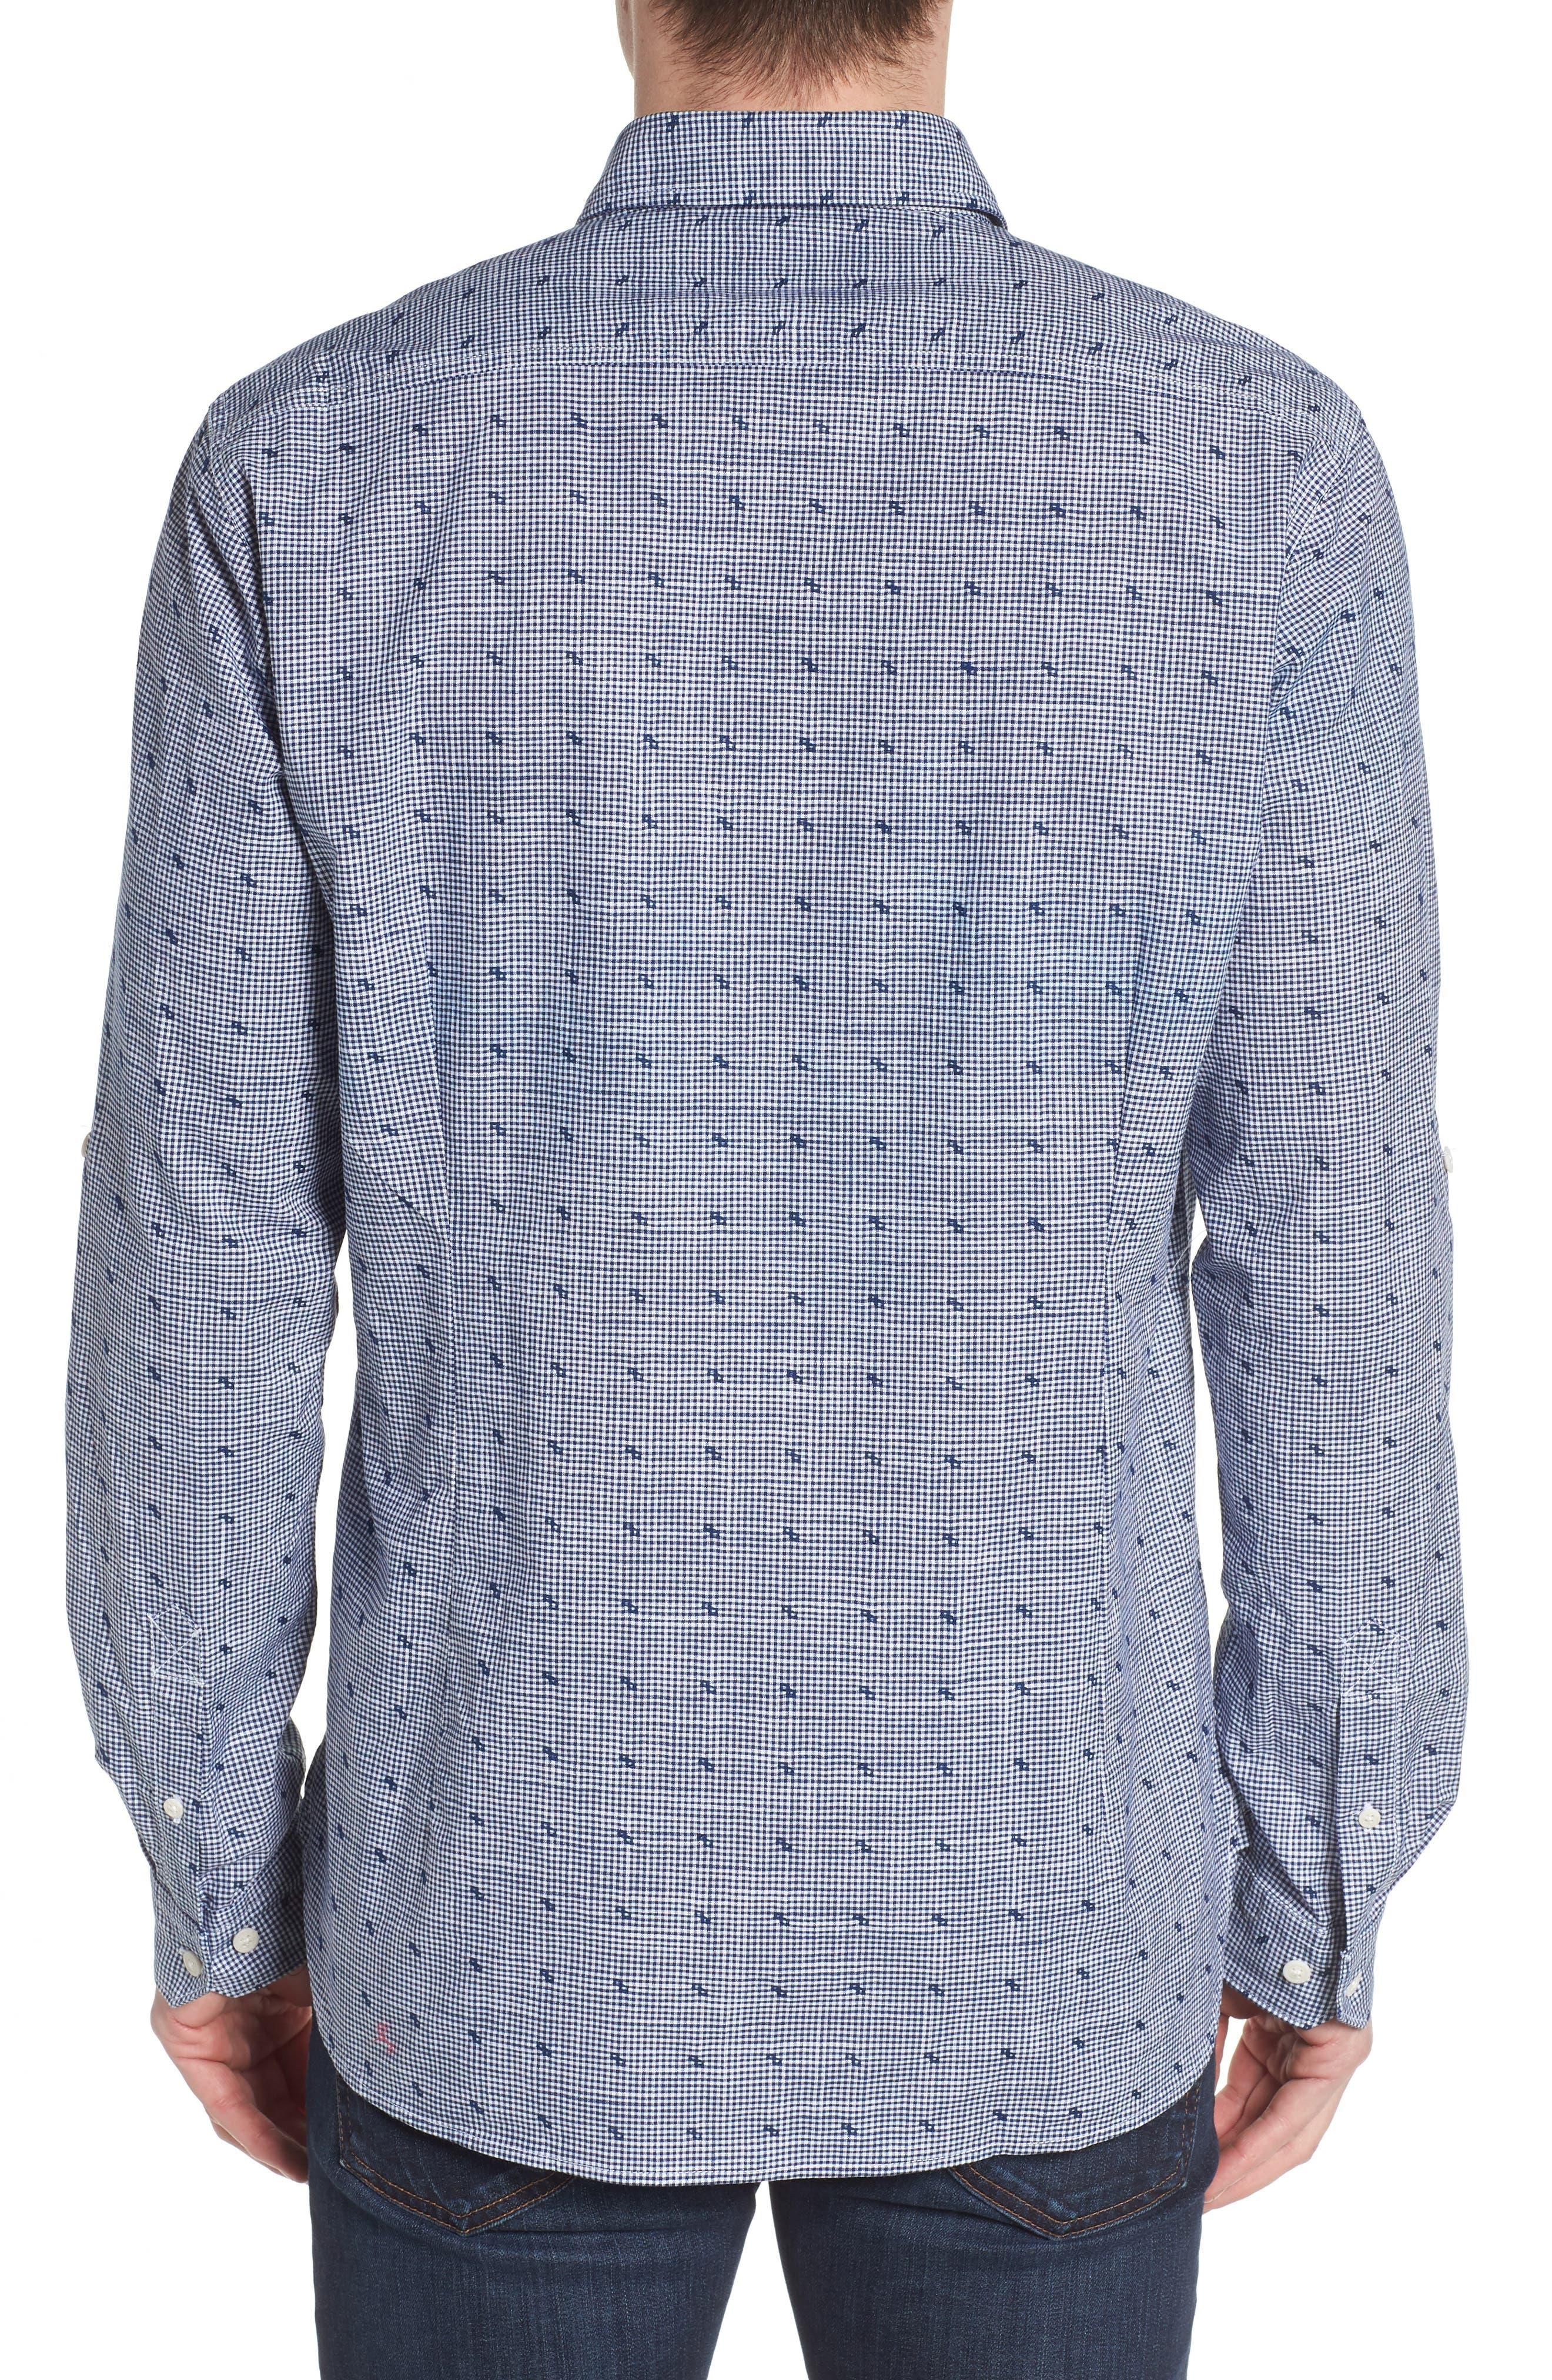 Beluga Regular Fit Check Sport Shirt,                             Alternate thumbnail 3, color,                             Navy